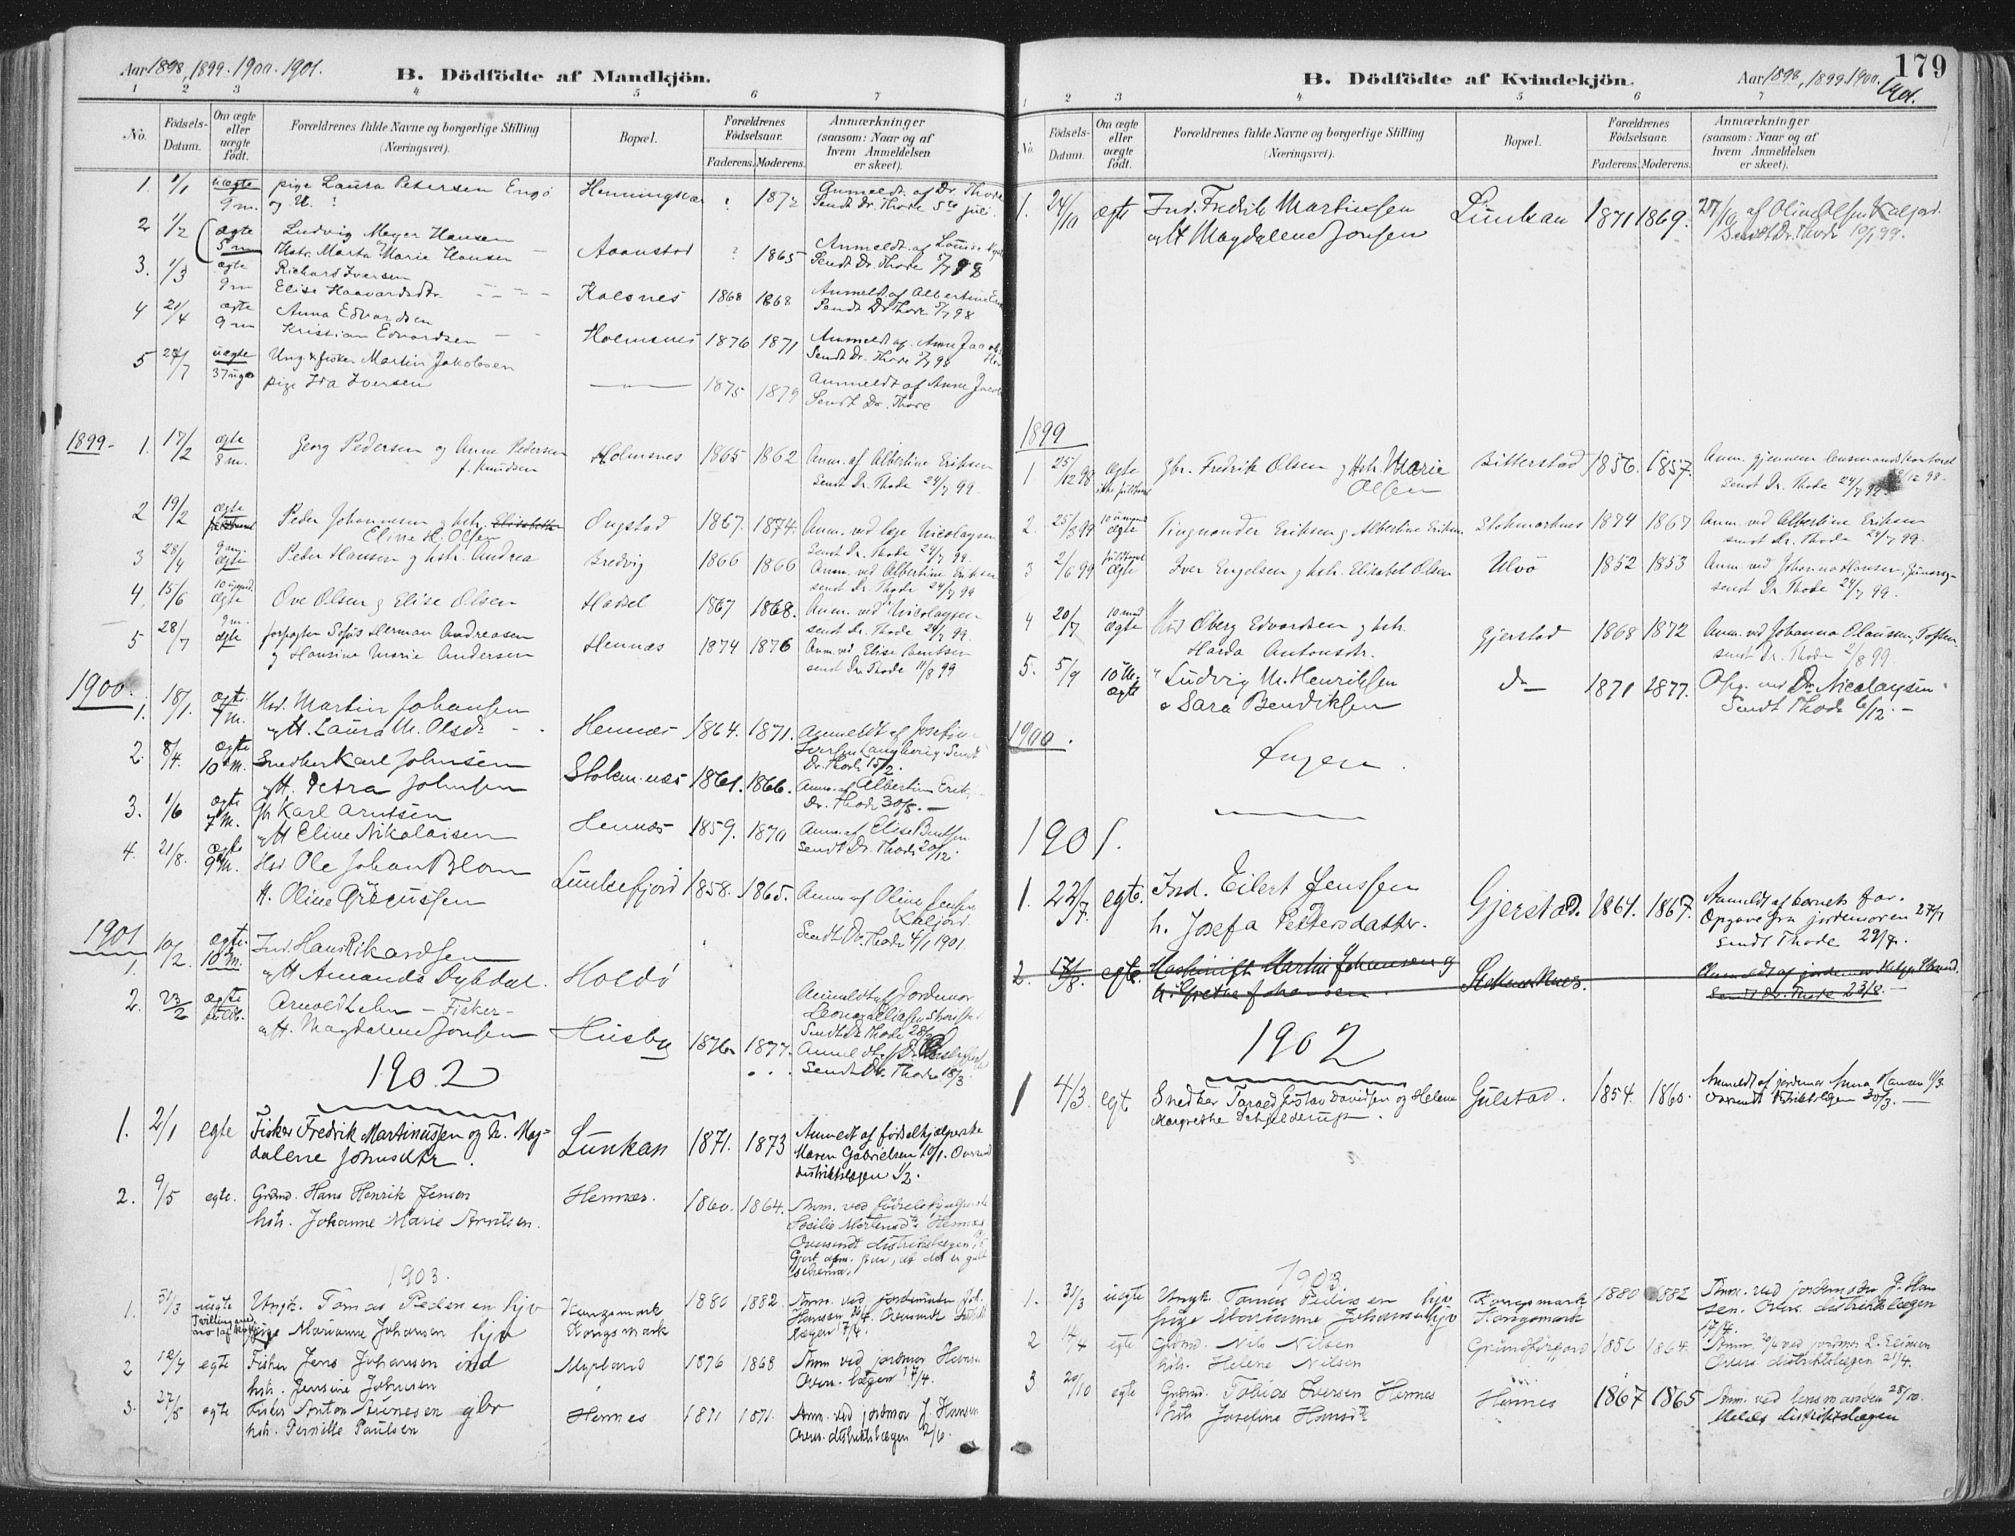 SAT, Ministerialprotokoller, klokkerbøker og fødselsregistre - Nordland, 888/L1246: Ministerialbok nr. 888A12, 1891-1903, s. 179